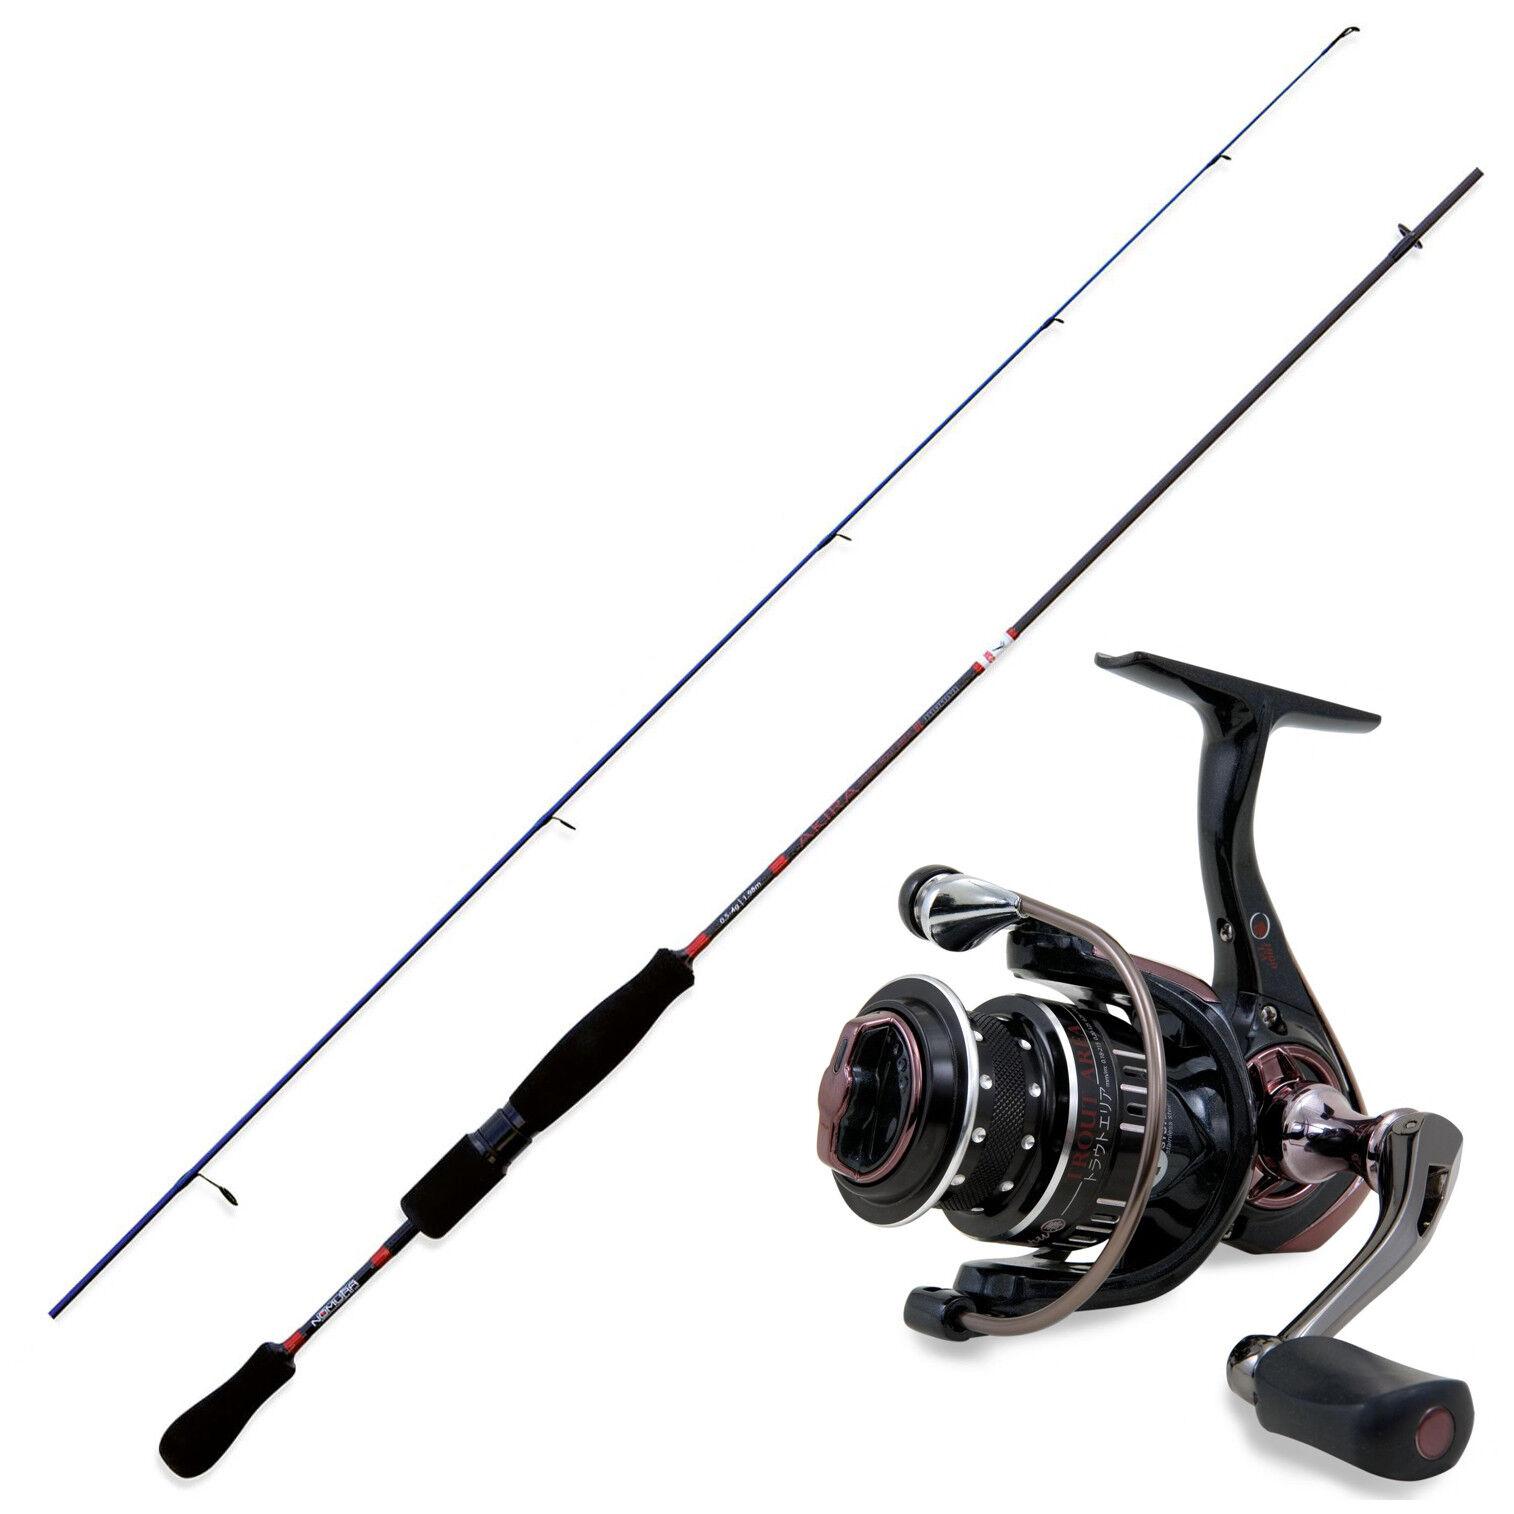 KP3574 Kit de pesca de trucha Nomura Akira Solid caña 1,70 m + Cocherete Haru